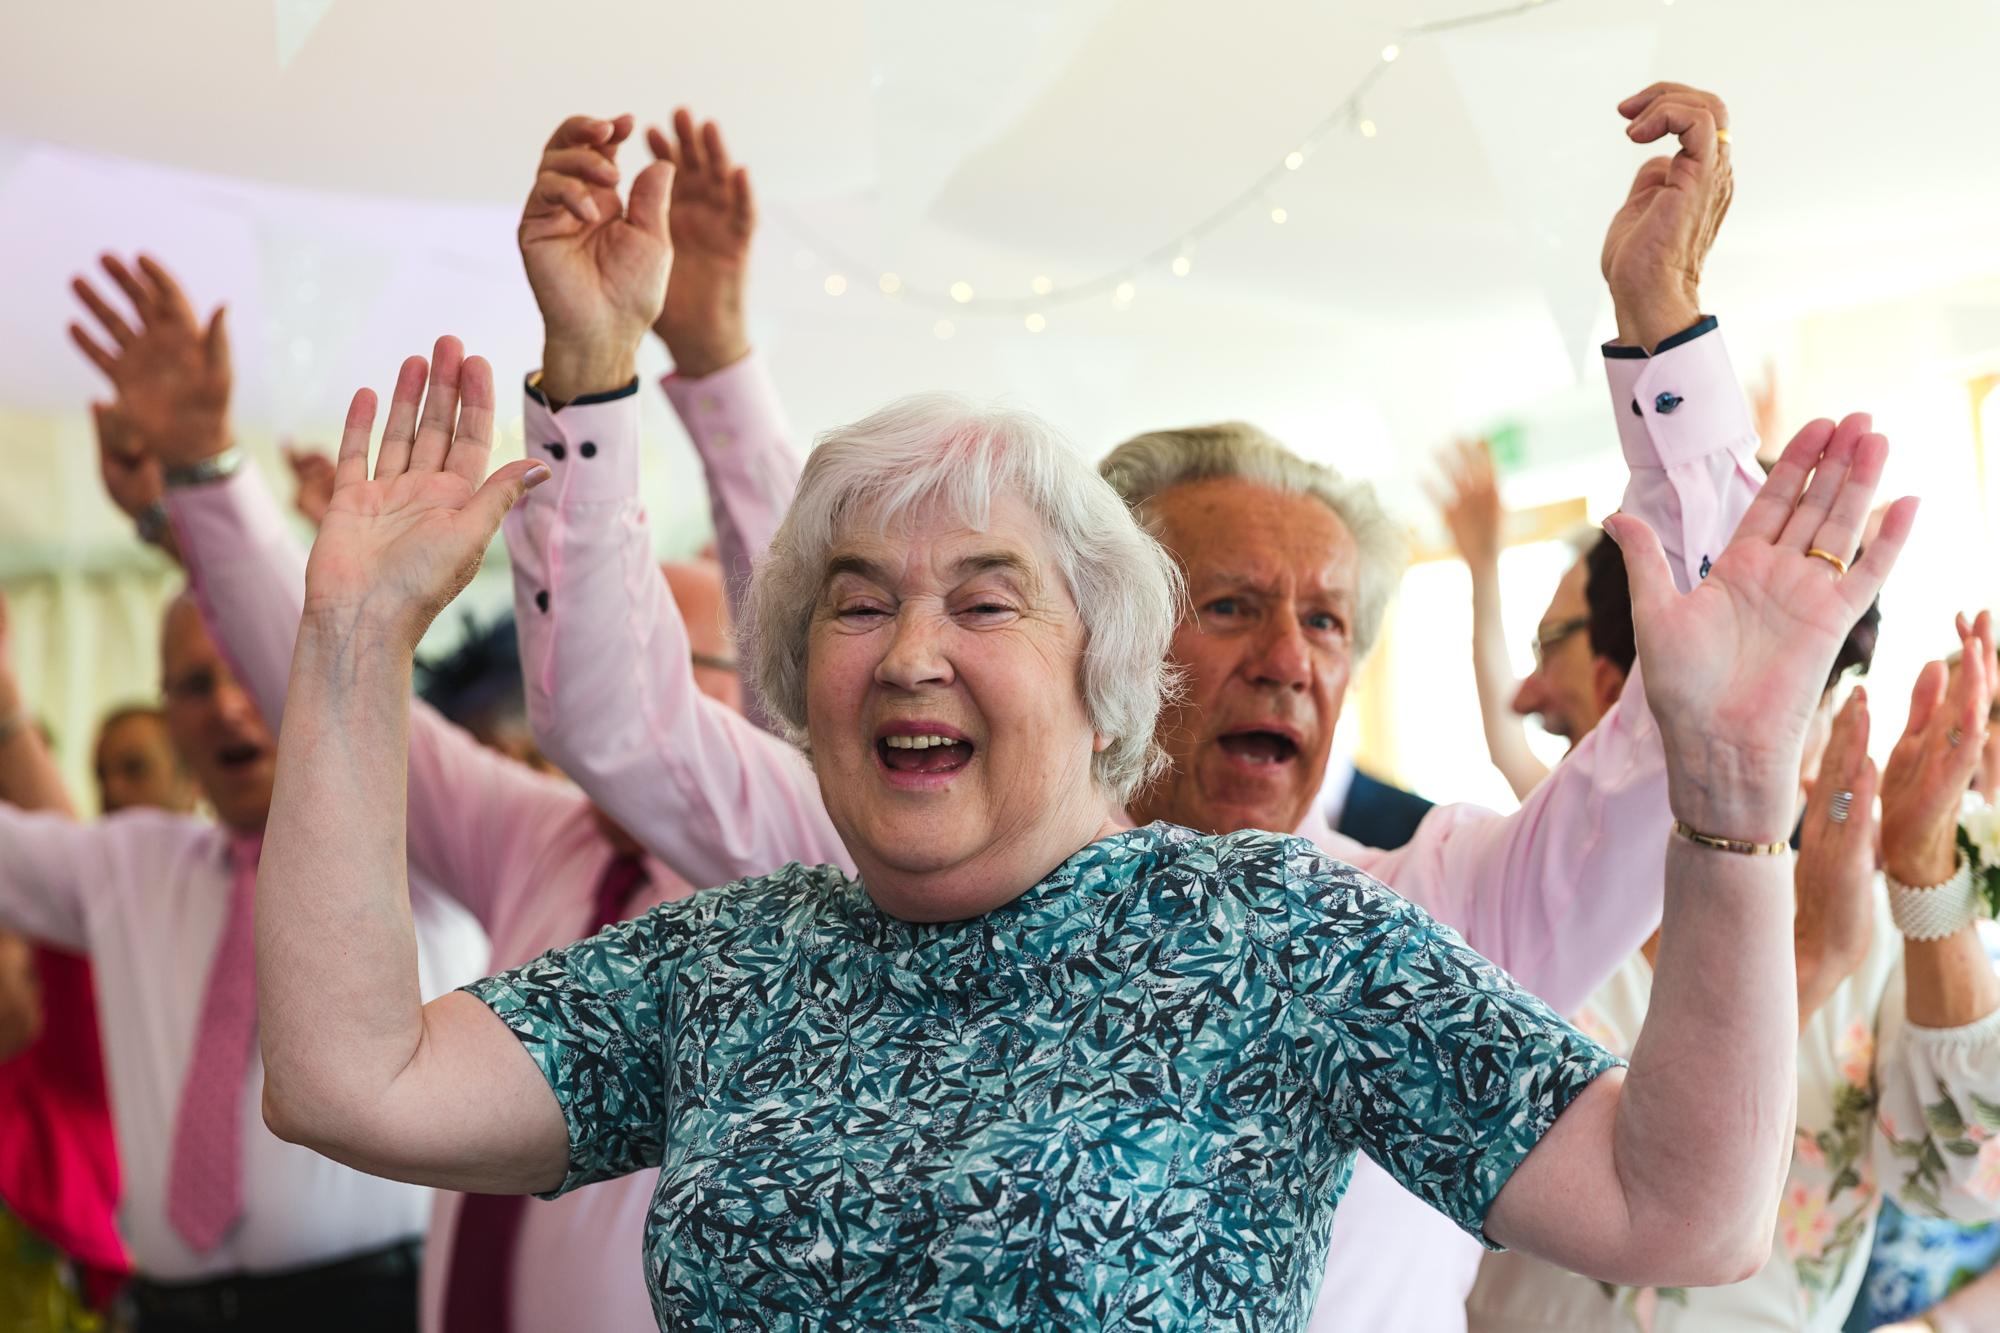 wedding guests dancing at Ridgeway golf club, Caerphilly Mountain